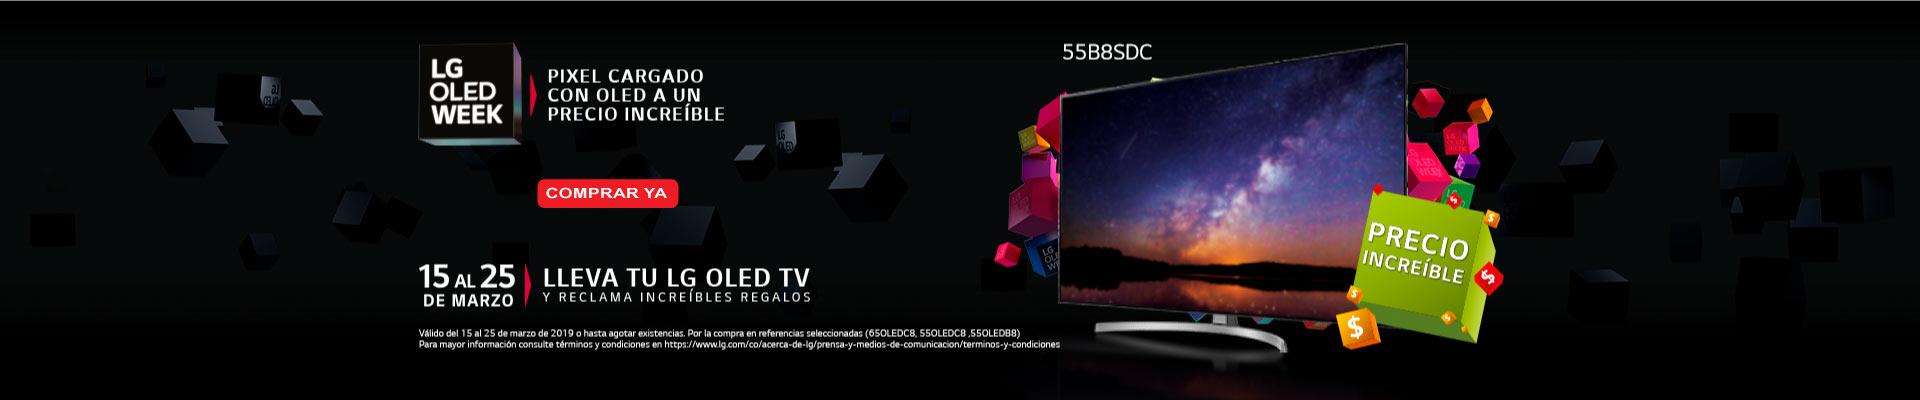 BP ALKP LG-TV-55-OLED